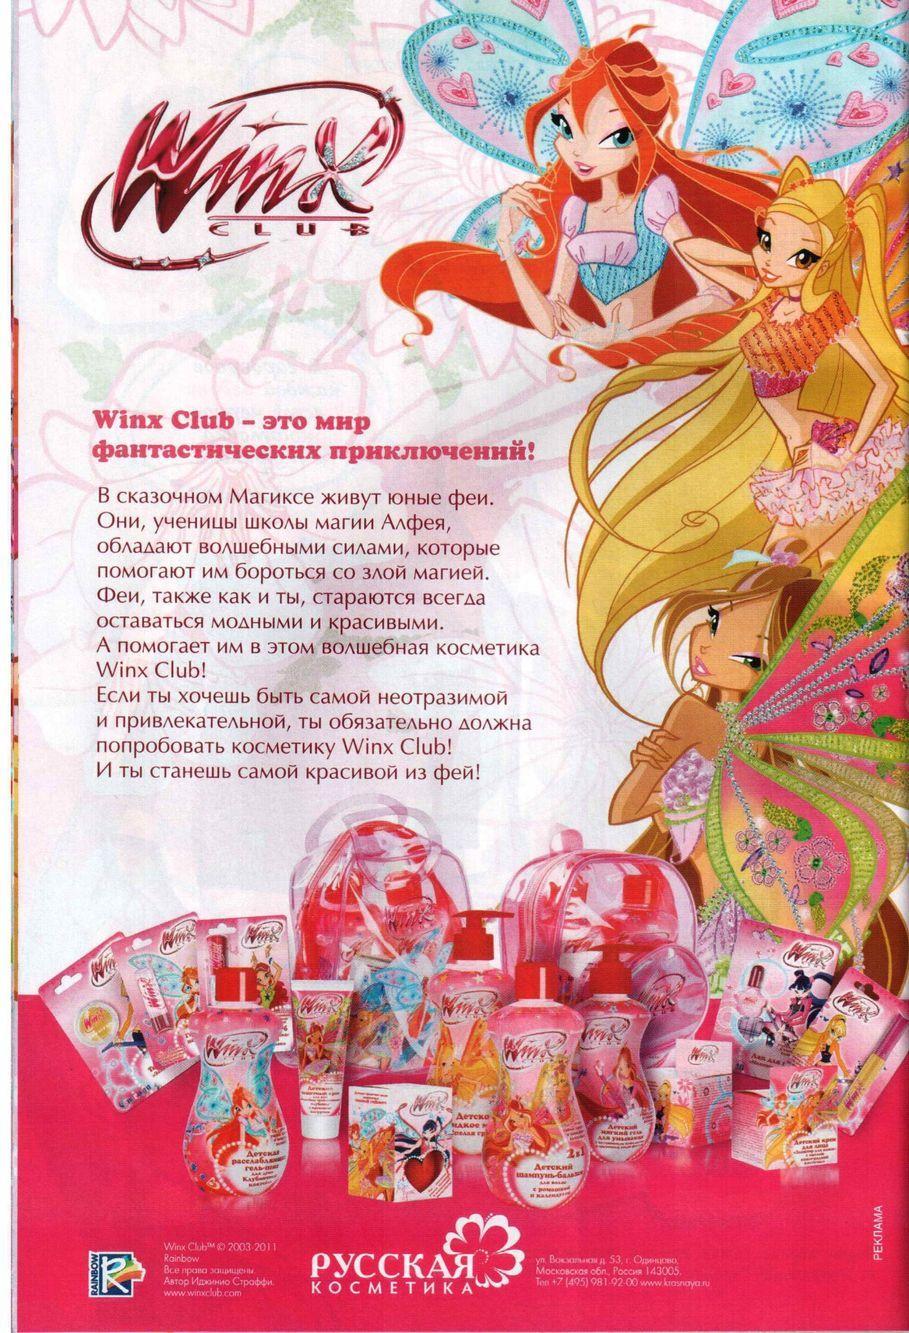 Комикс Винкс Winx - Опасный замысел (Журнал Винкс №10 2011) - стр. 2